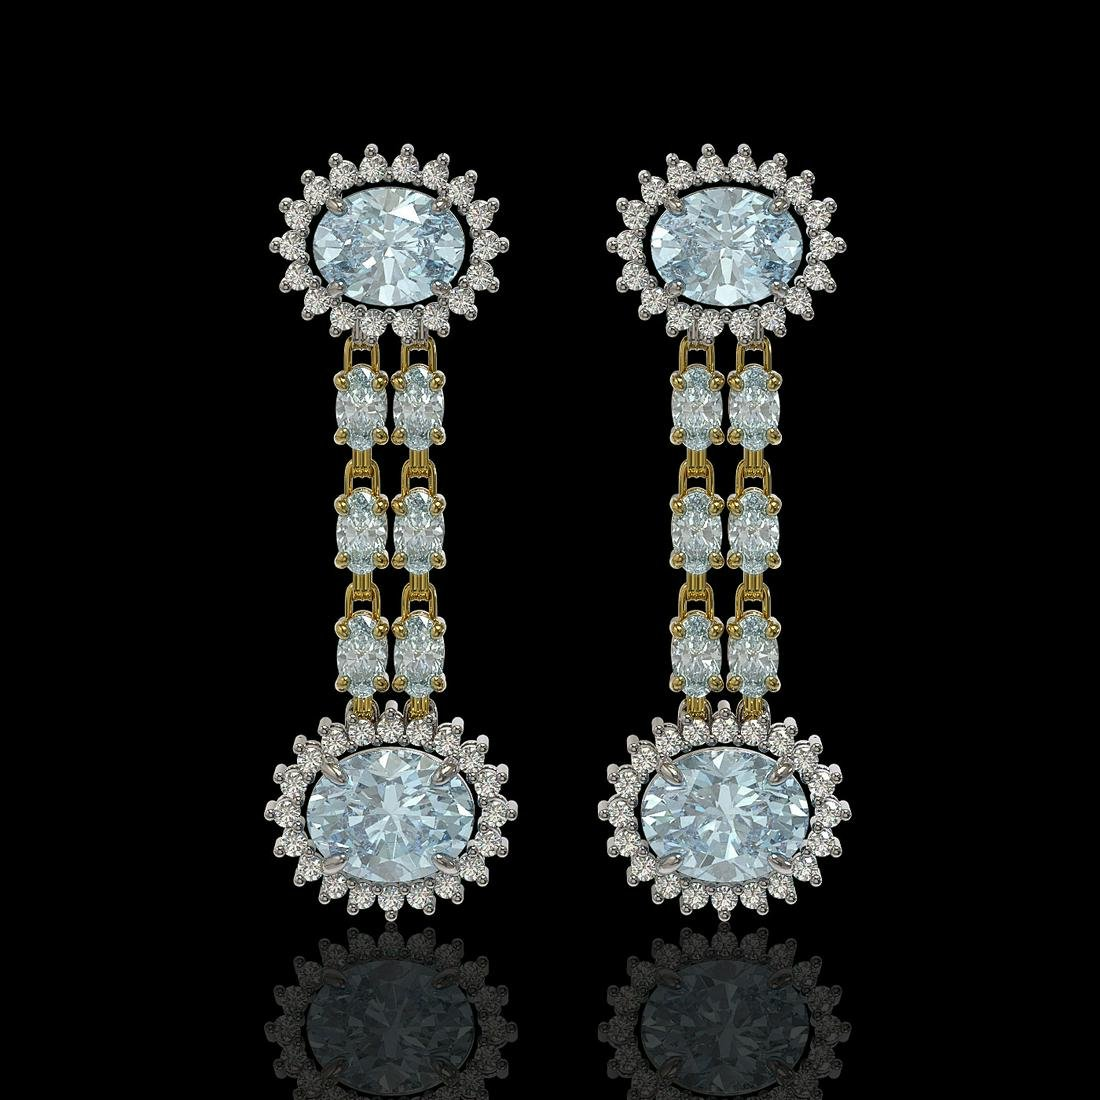 9.85 ctw Sky Topaz & Diamond Earrings 14K Yellow Gold